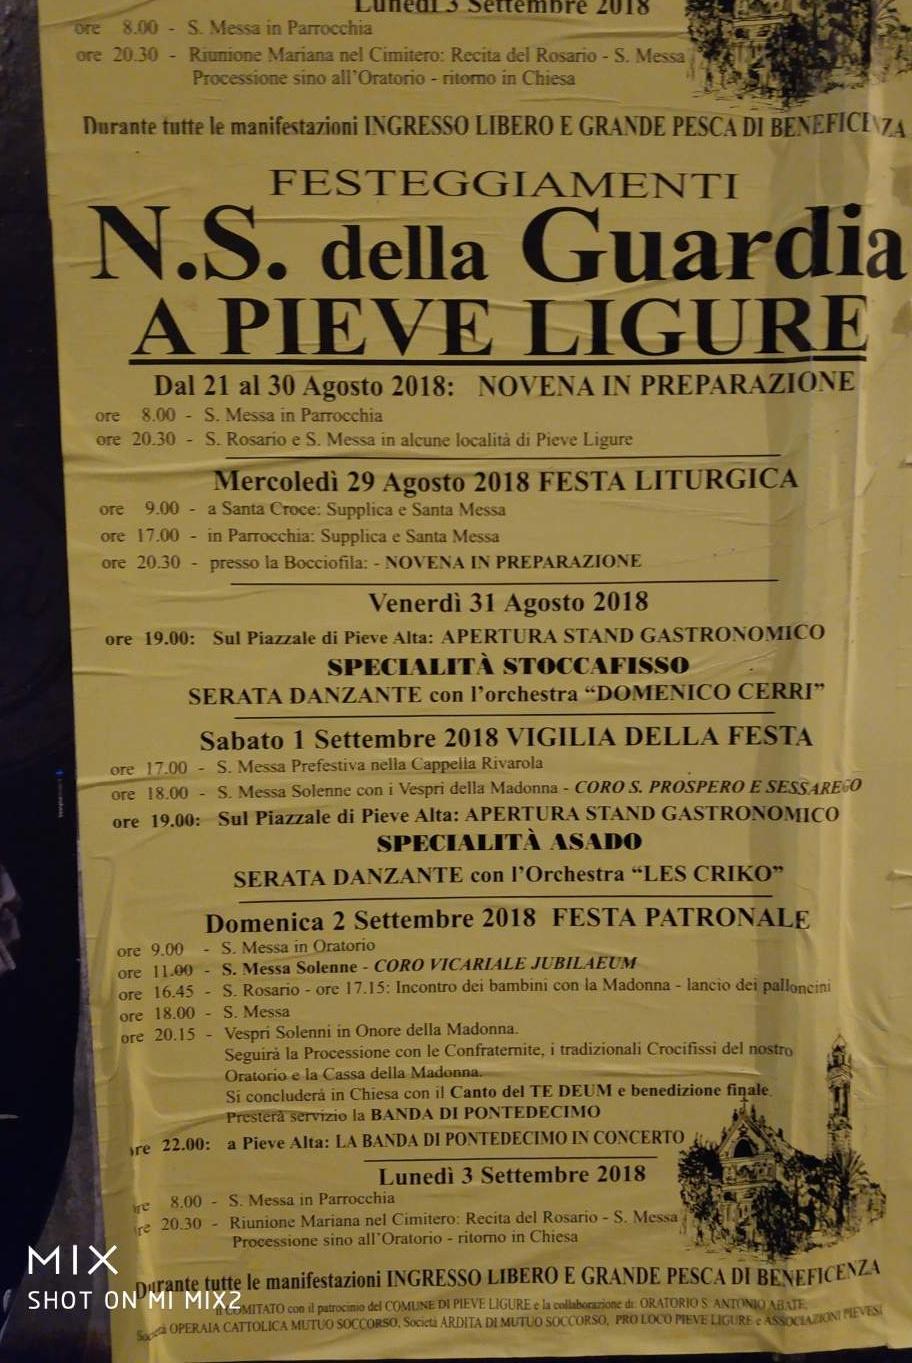 Nostra Signora Della Guardia SOCMS Pieve Alta Piazza San Michele, 16031 Pieve Ligure Dal 29/08/2018 Al 02/09/2018 19:00 - 01:00